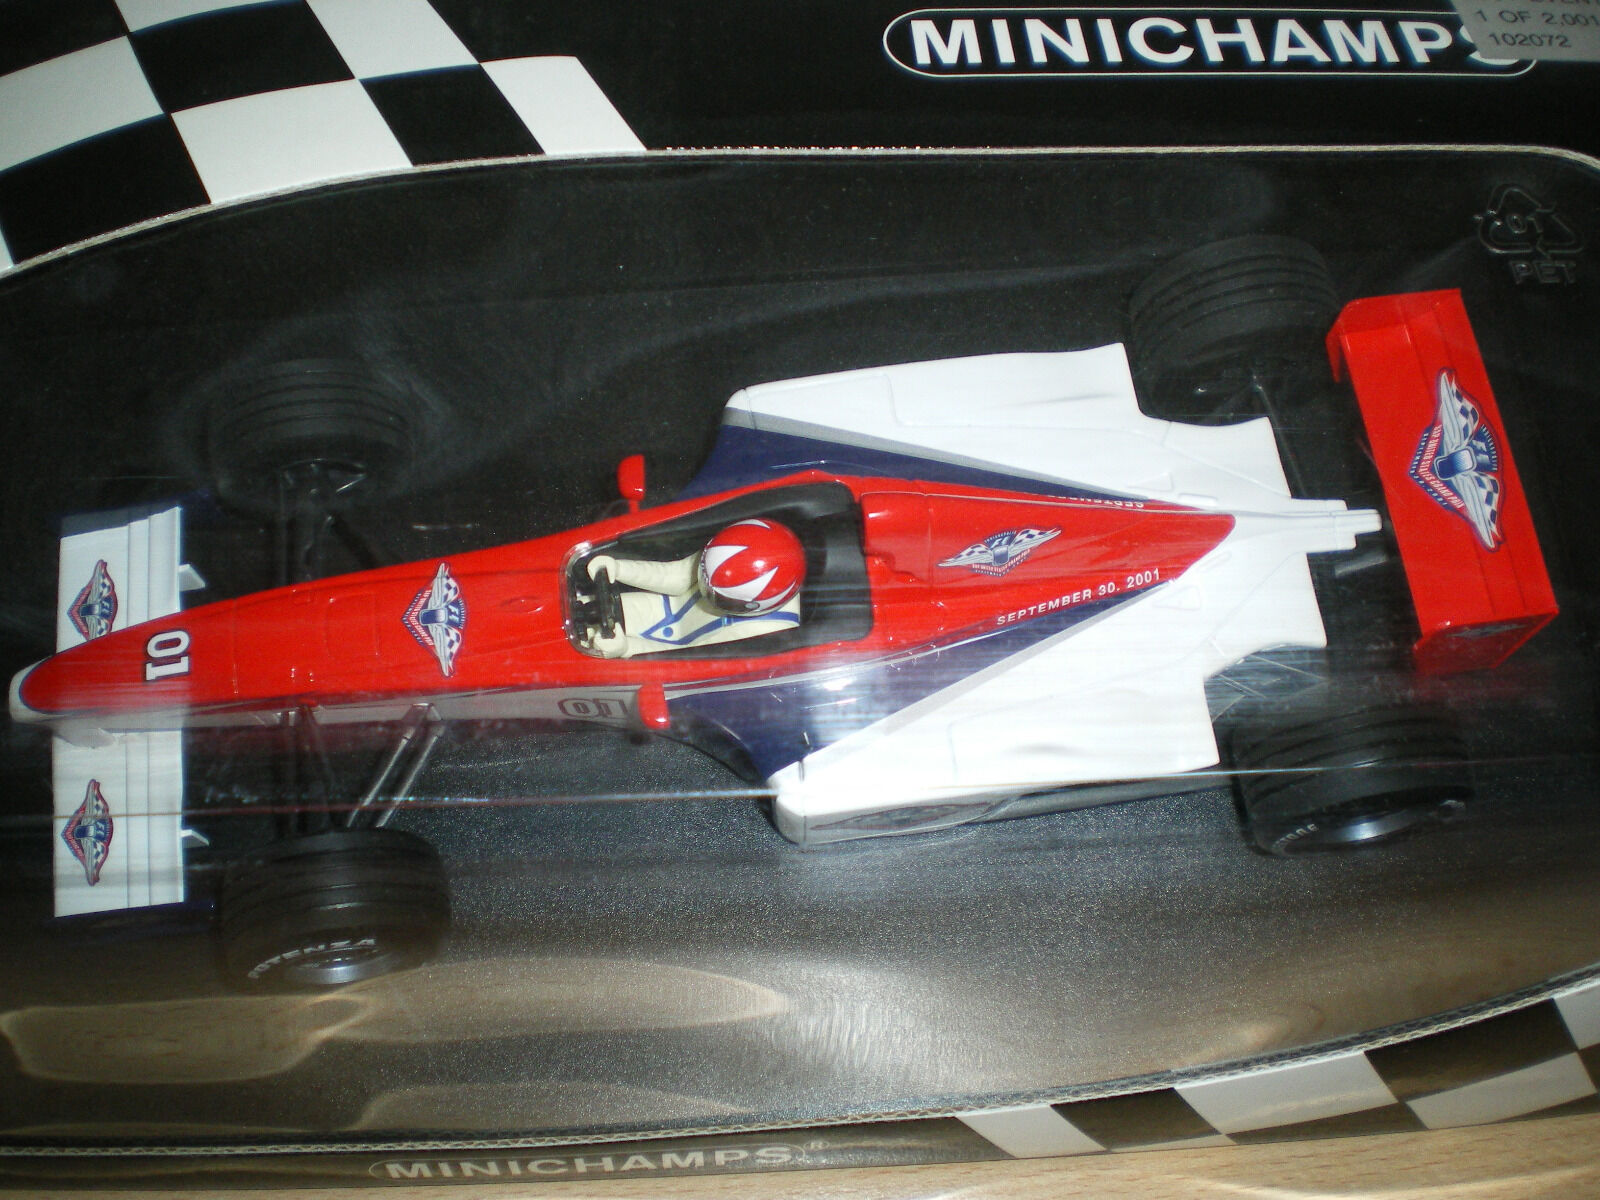 F1 US GP inaugural event car 2001 F 300 1 18 minichamps